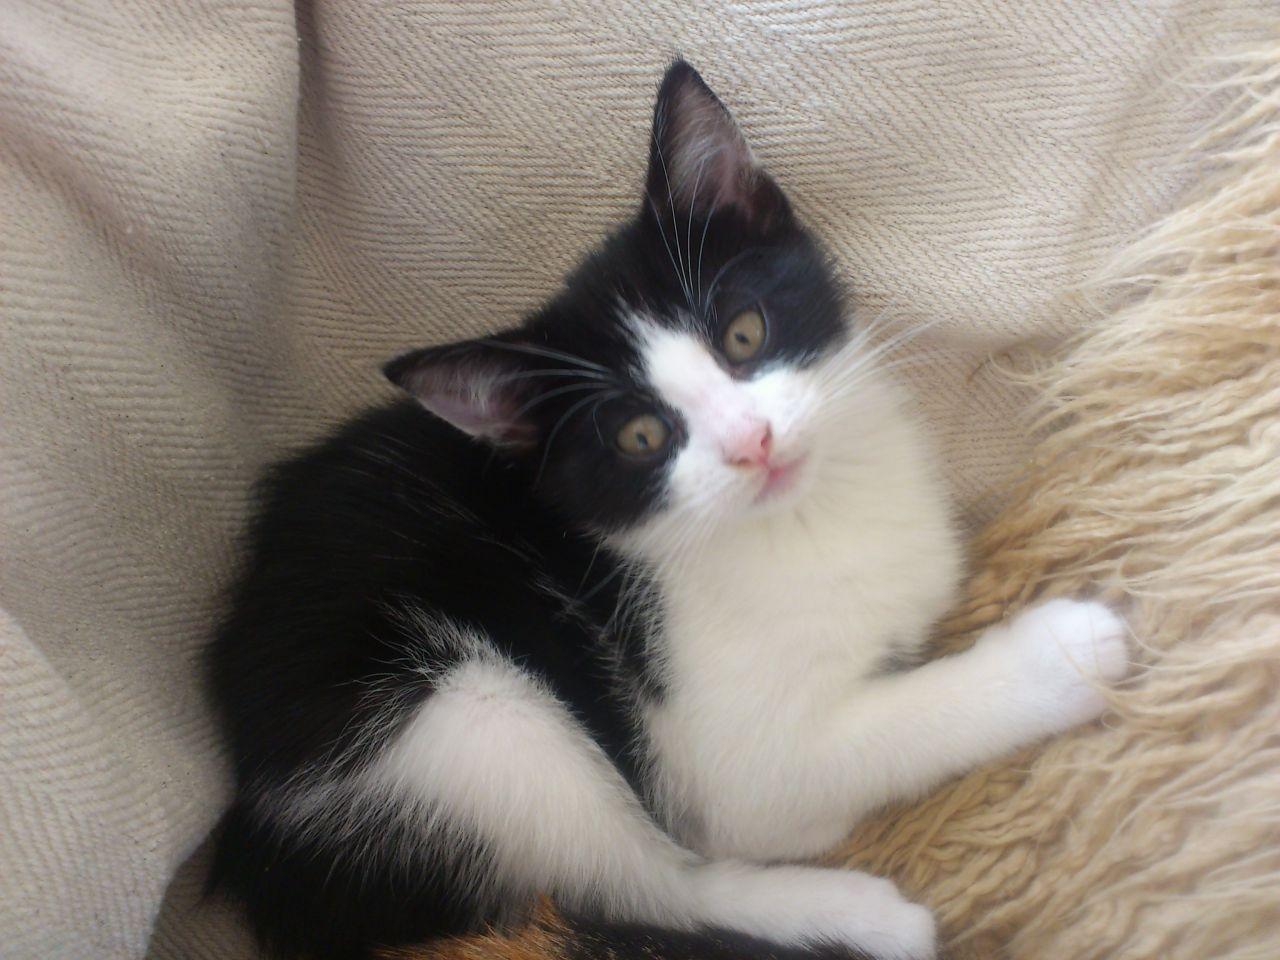 Black And White Kittens Kittens Photo 41499313 Fanpop